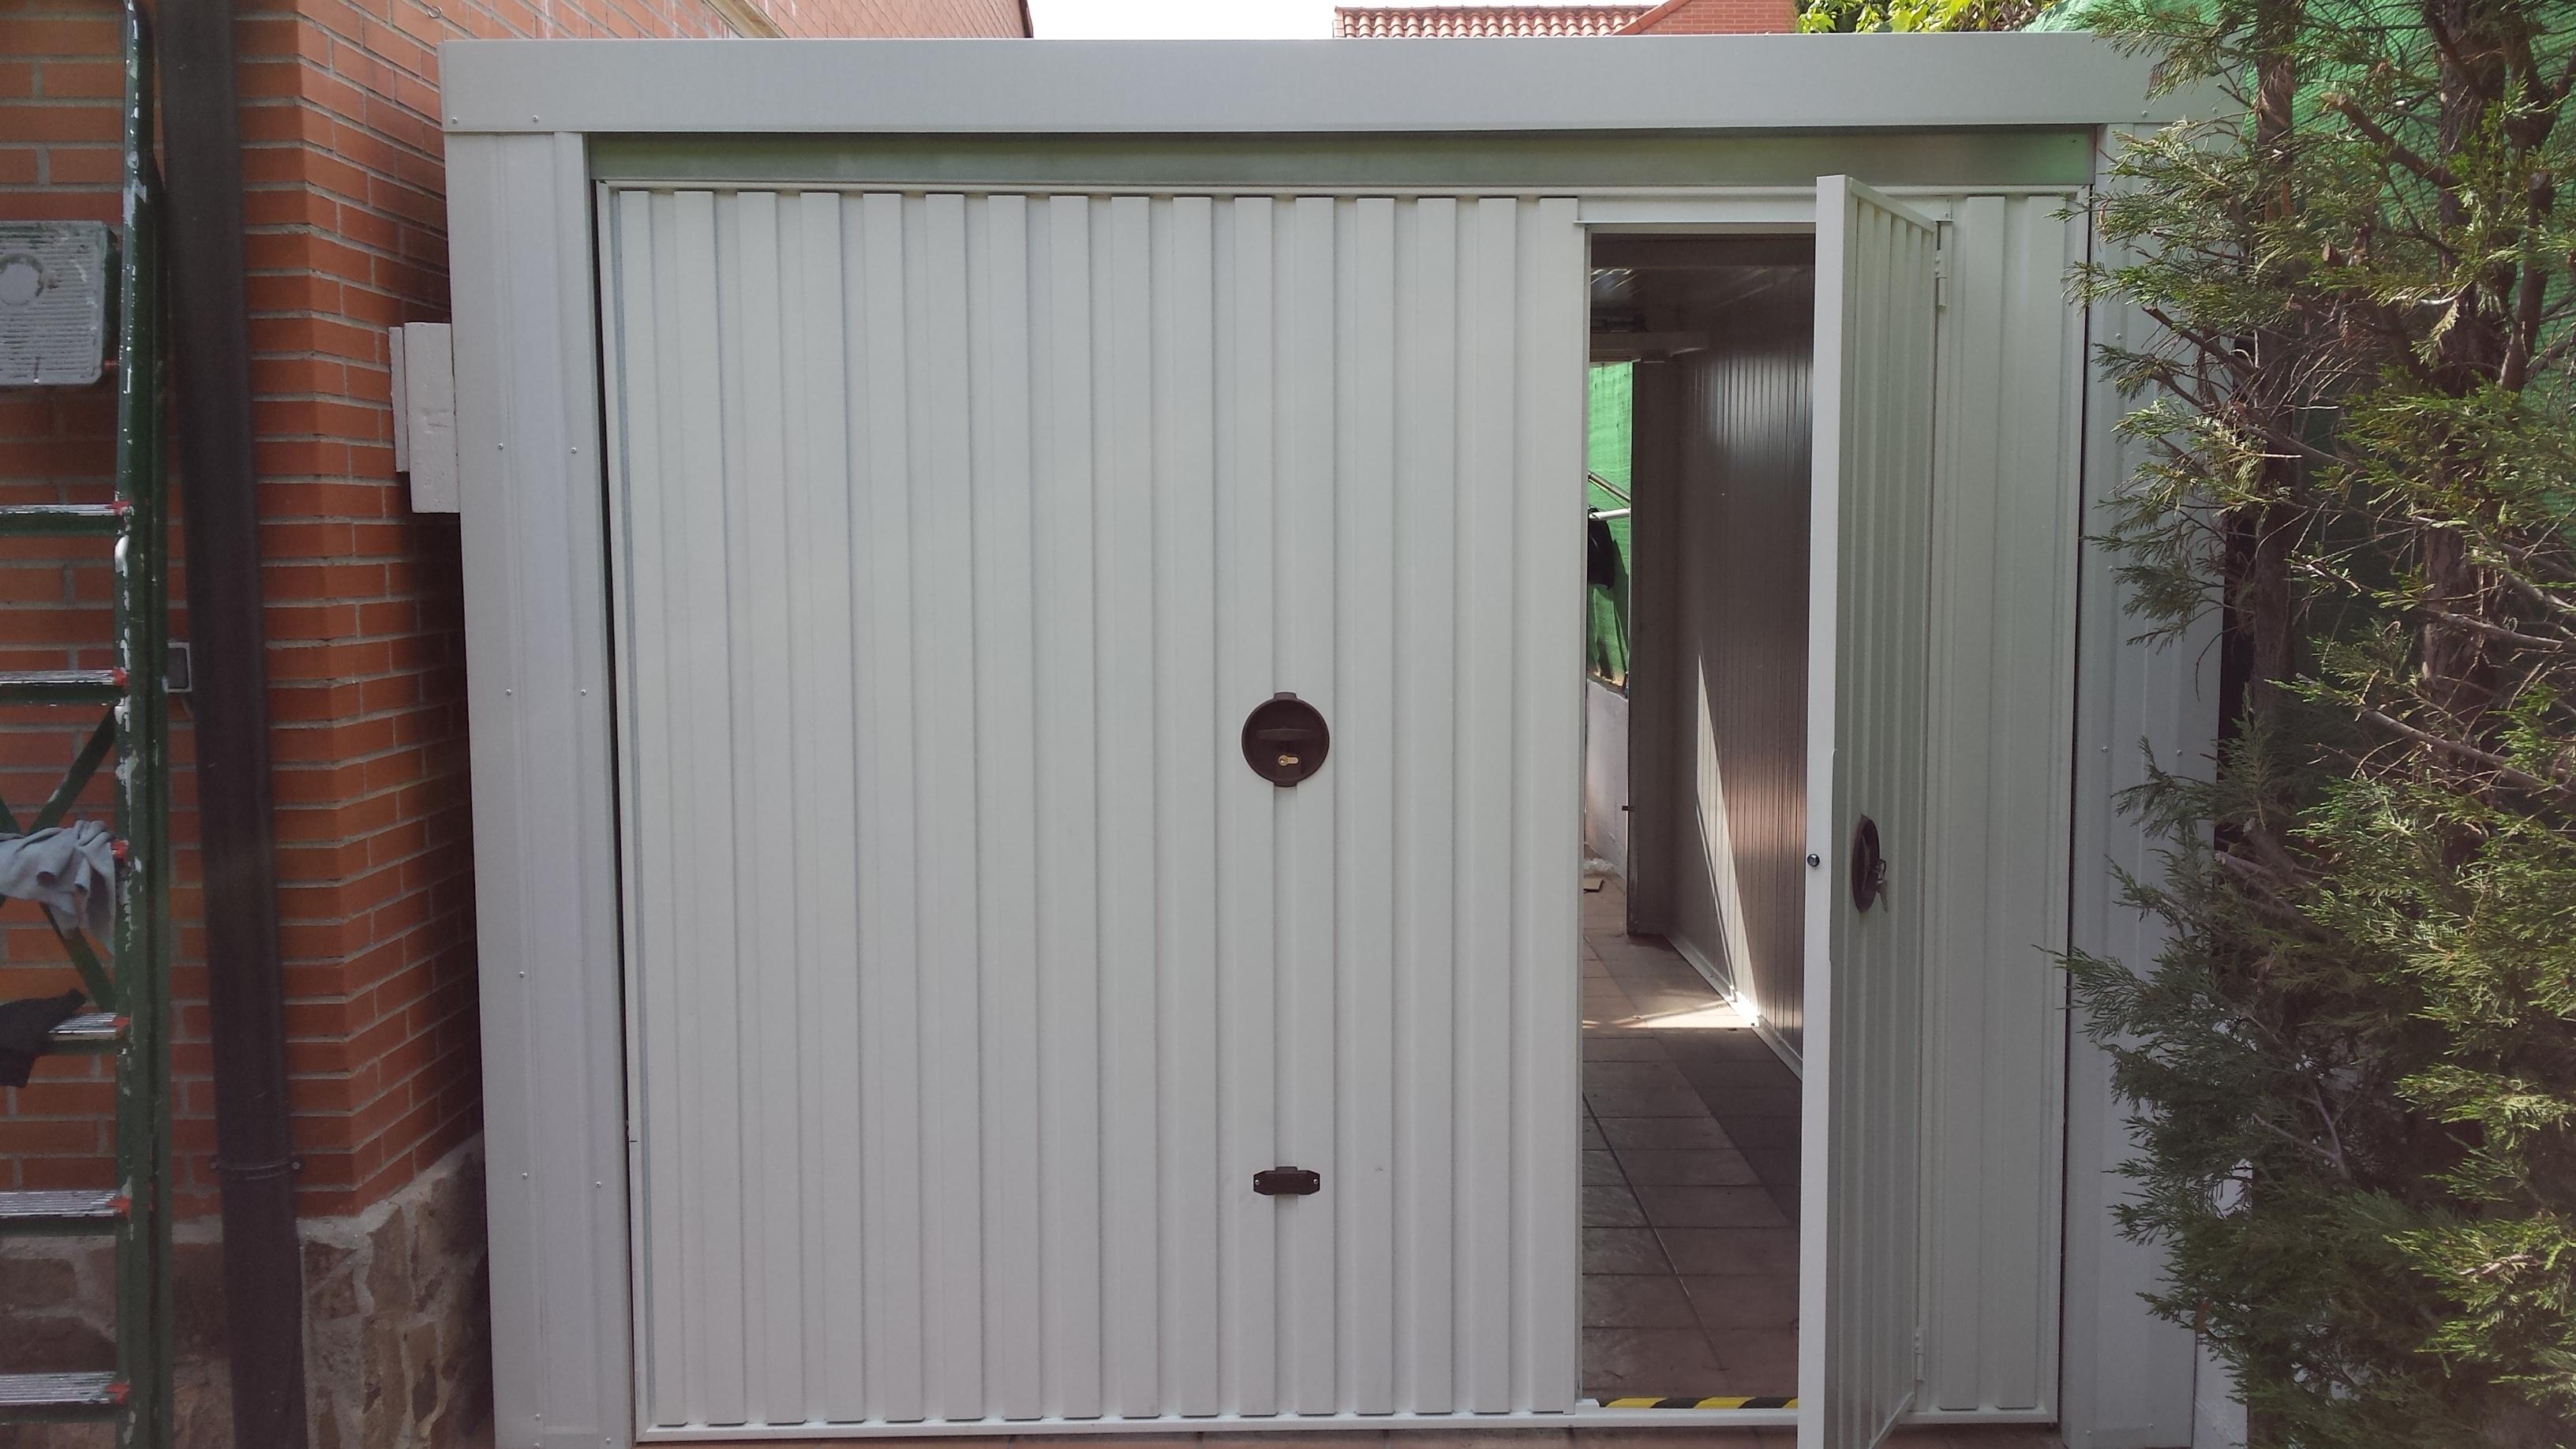 Garaje modular desmontable de paneles sandwich - Puertas de garaje murcia ...